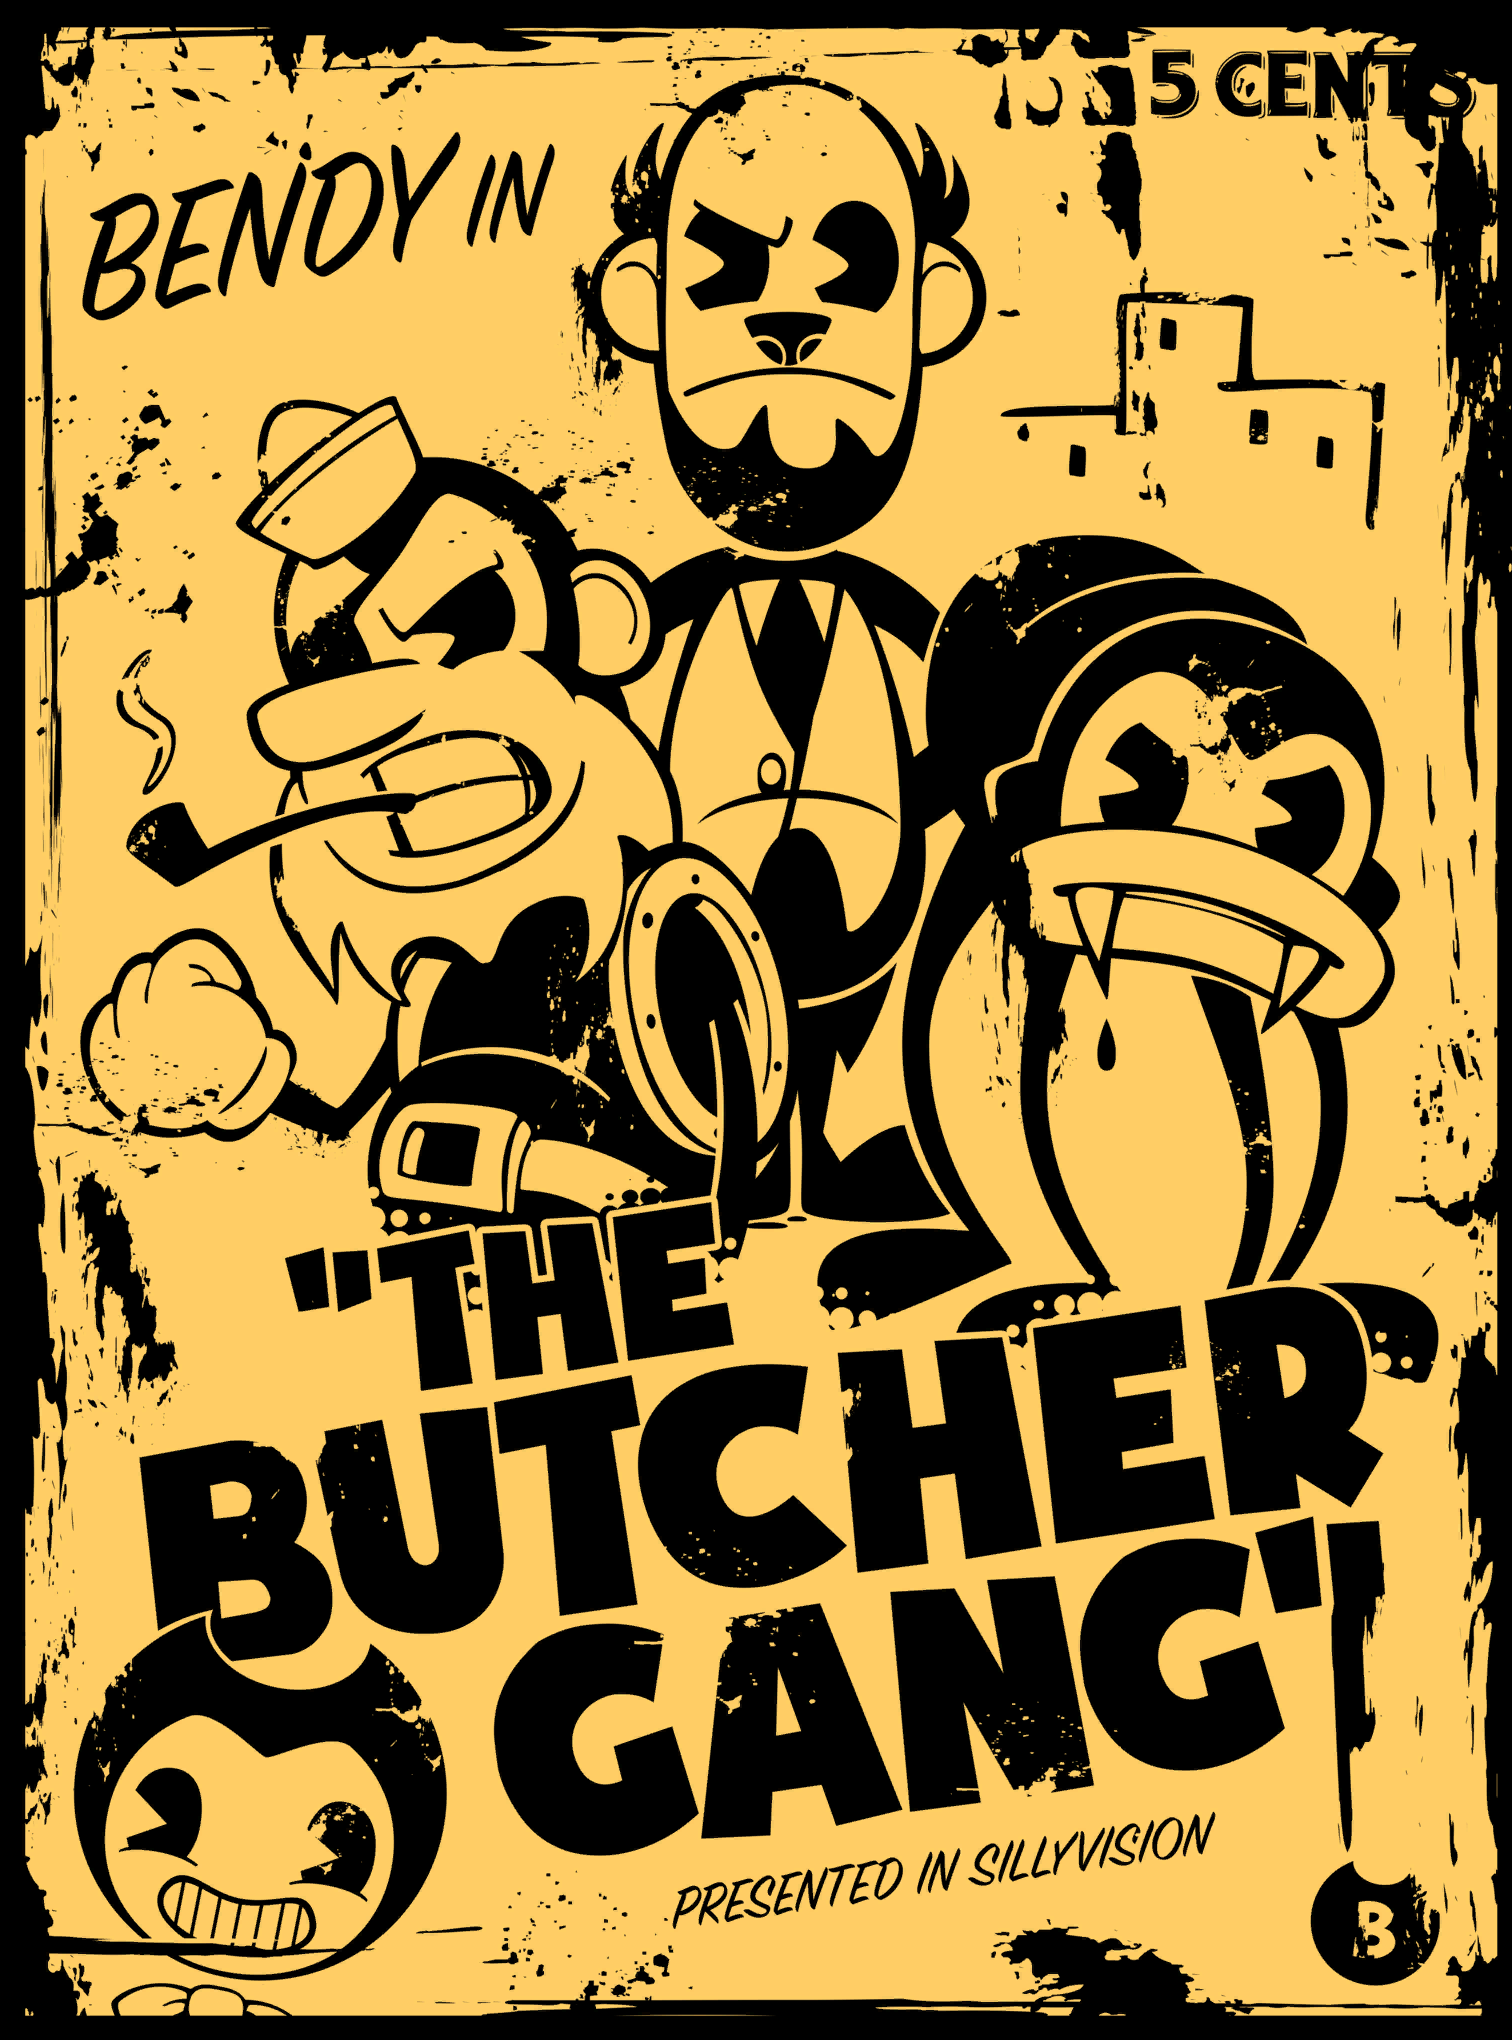 The Butcher Gang